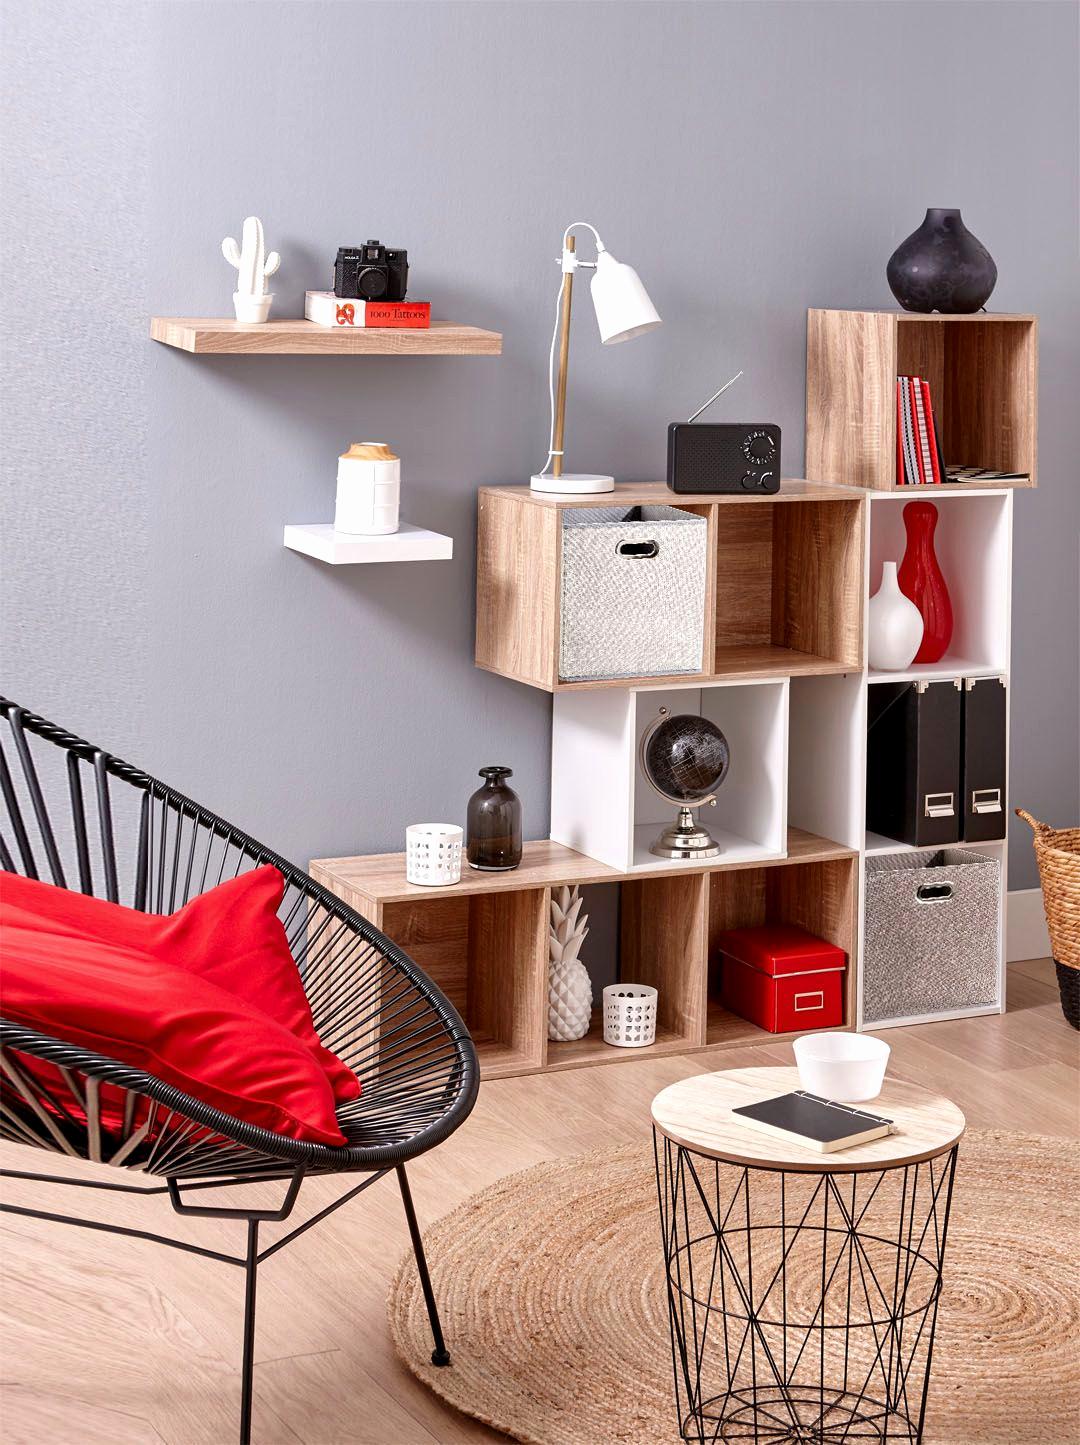 casier en fer elegant search results meuble casier en fer of casier en fer